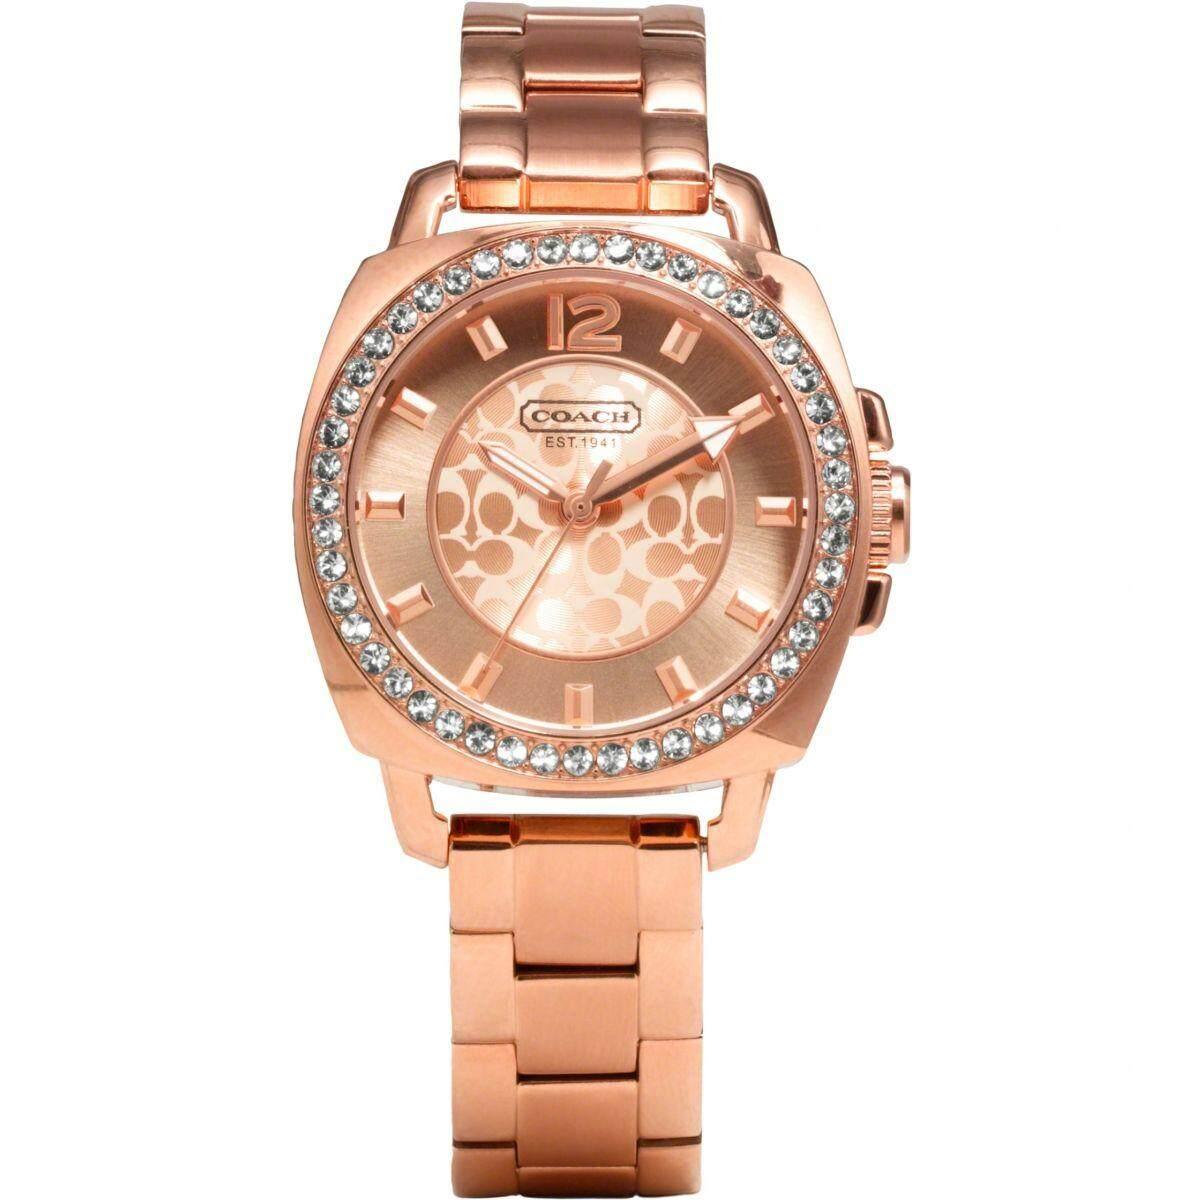 Original Coach Womens Mini Boyfriend Rose Gold Crystal Glitz Watch 14501701 with 2 Years Warranty Malaysia